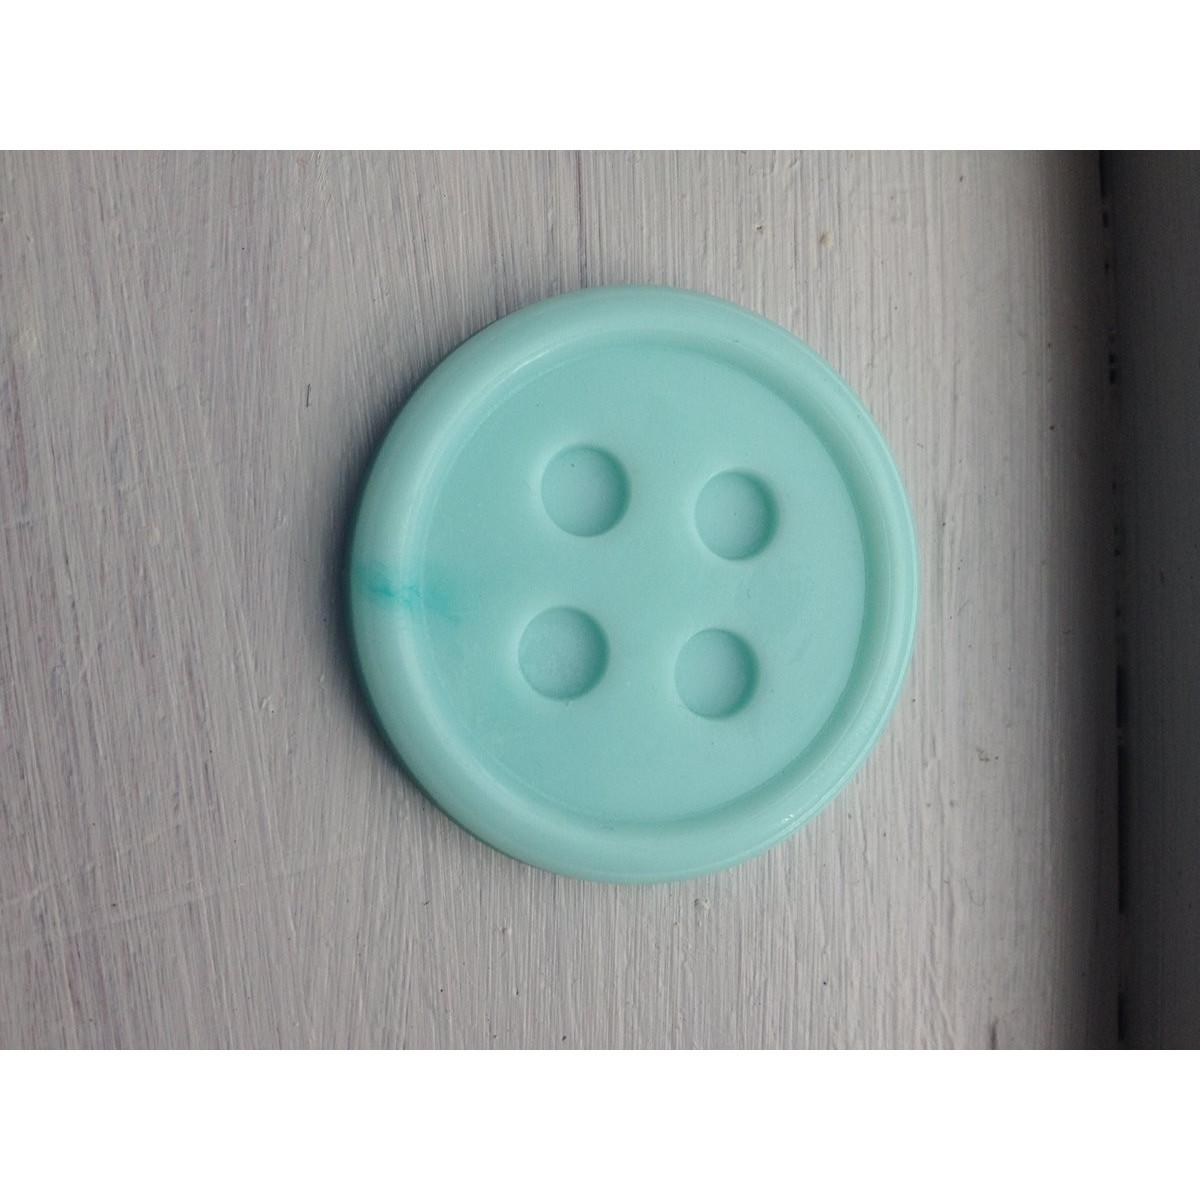 Cire colorante pour bougie Turquoise